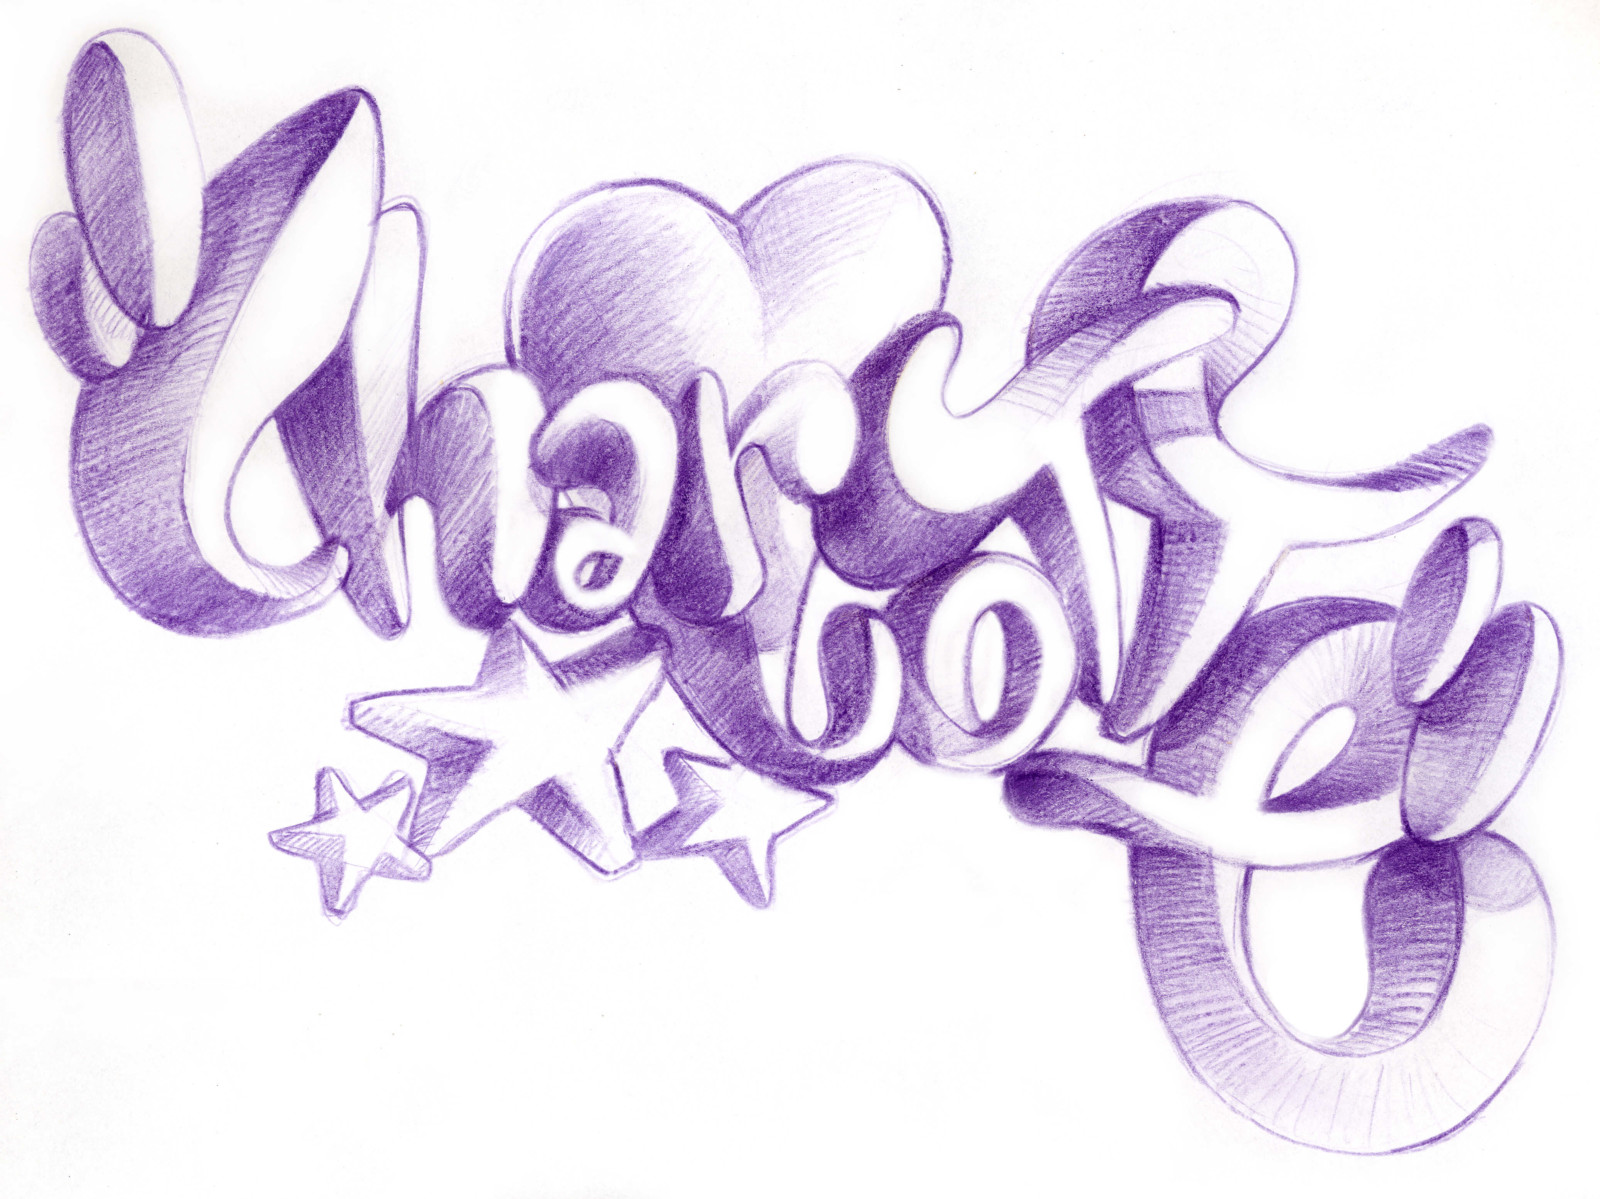 charlotte-dessin-2003-2004tiny